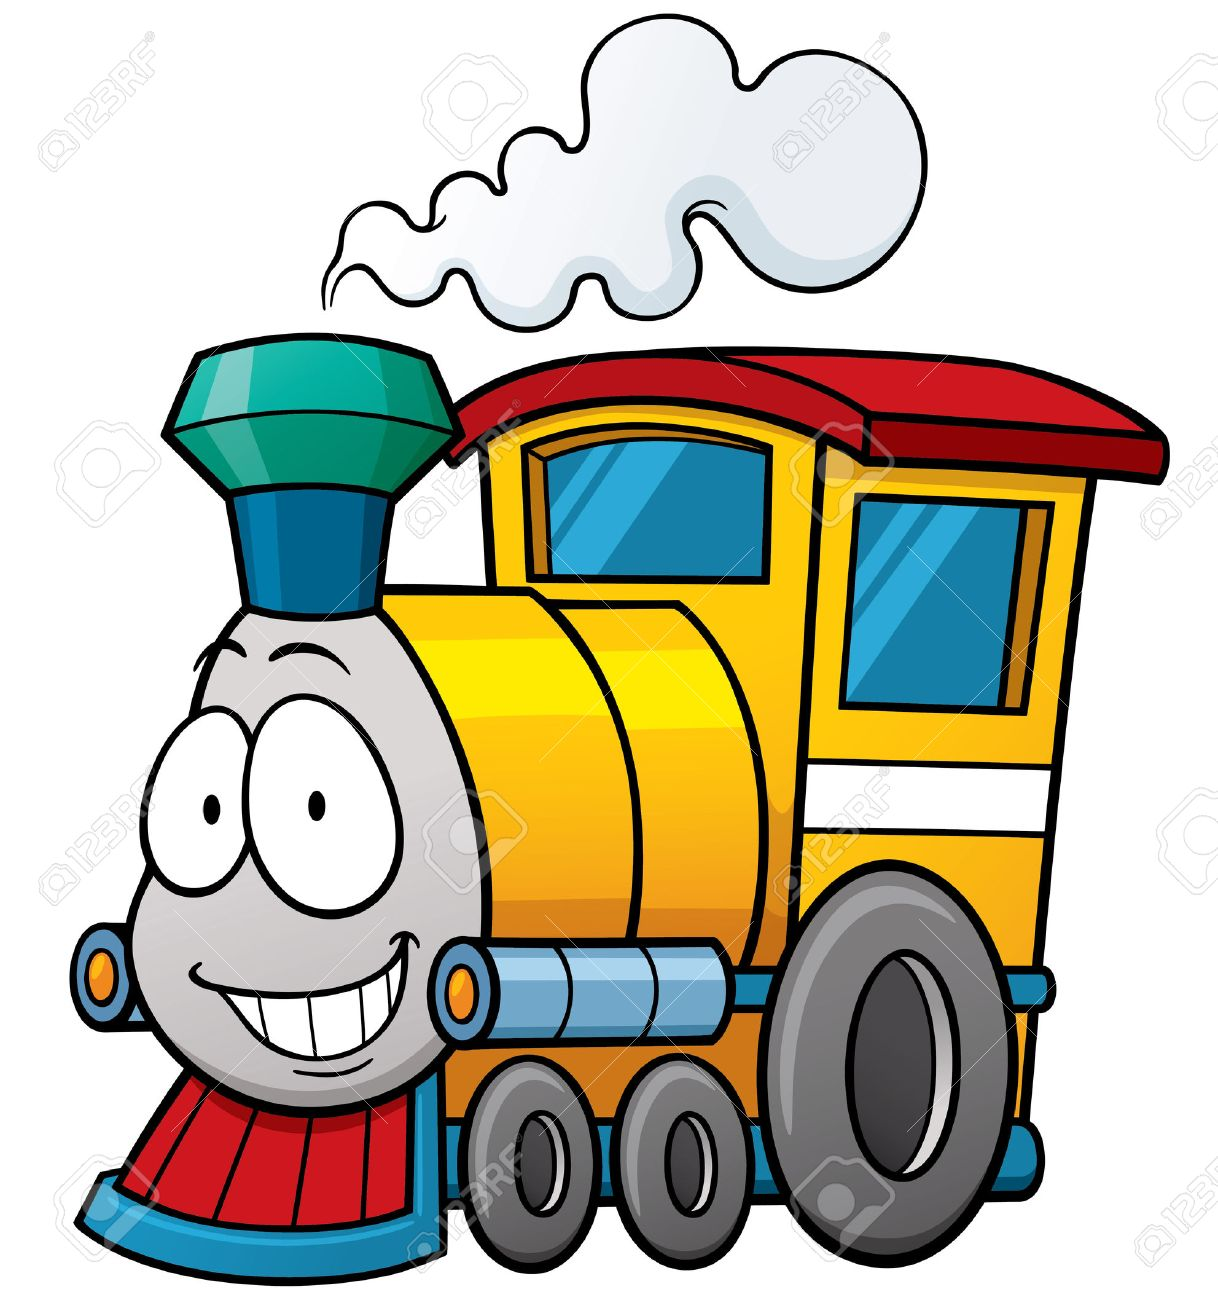 Vector illustration of cartoon train - 42123718